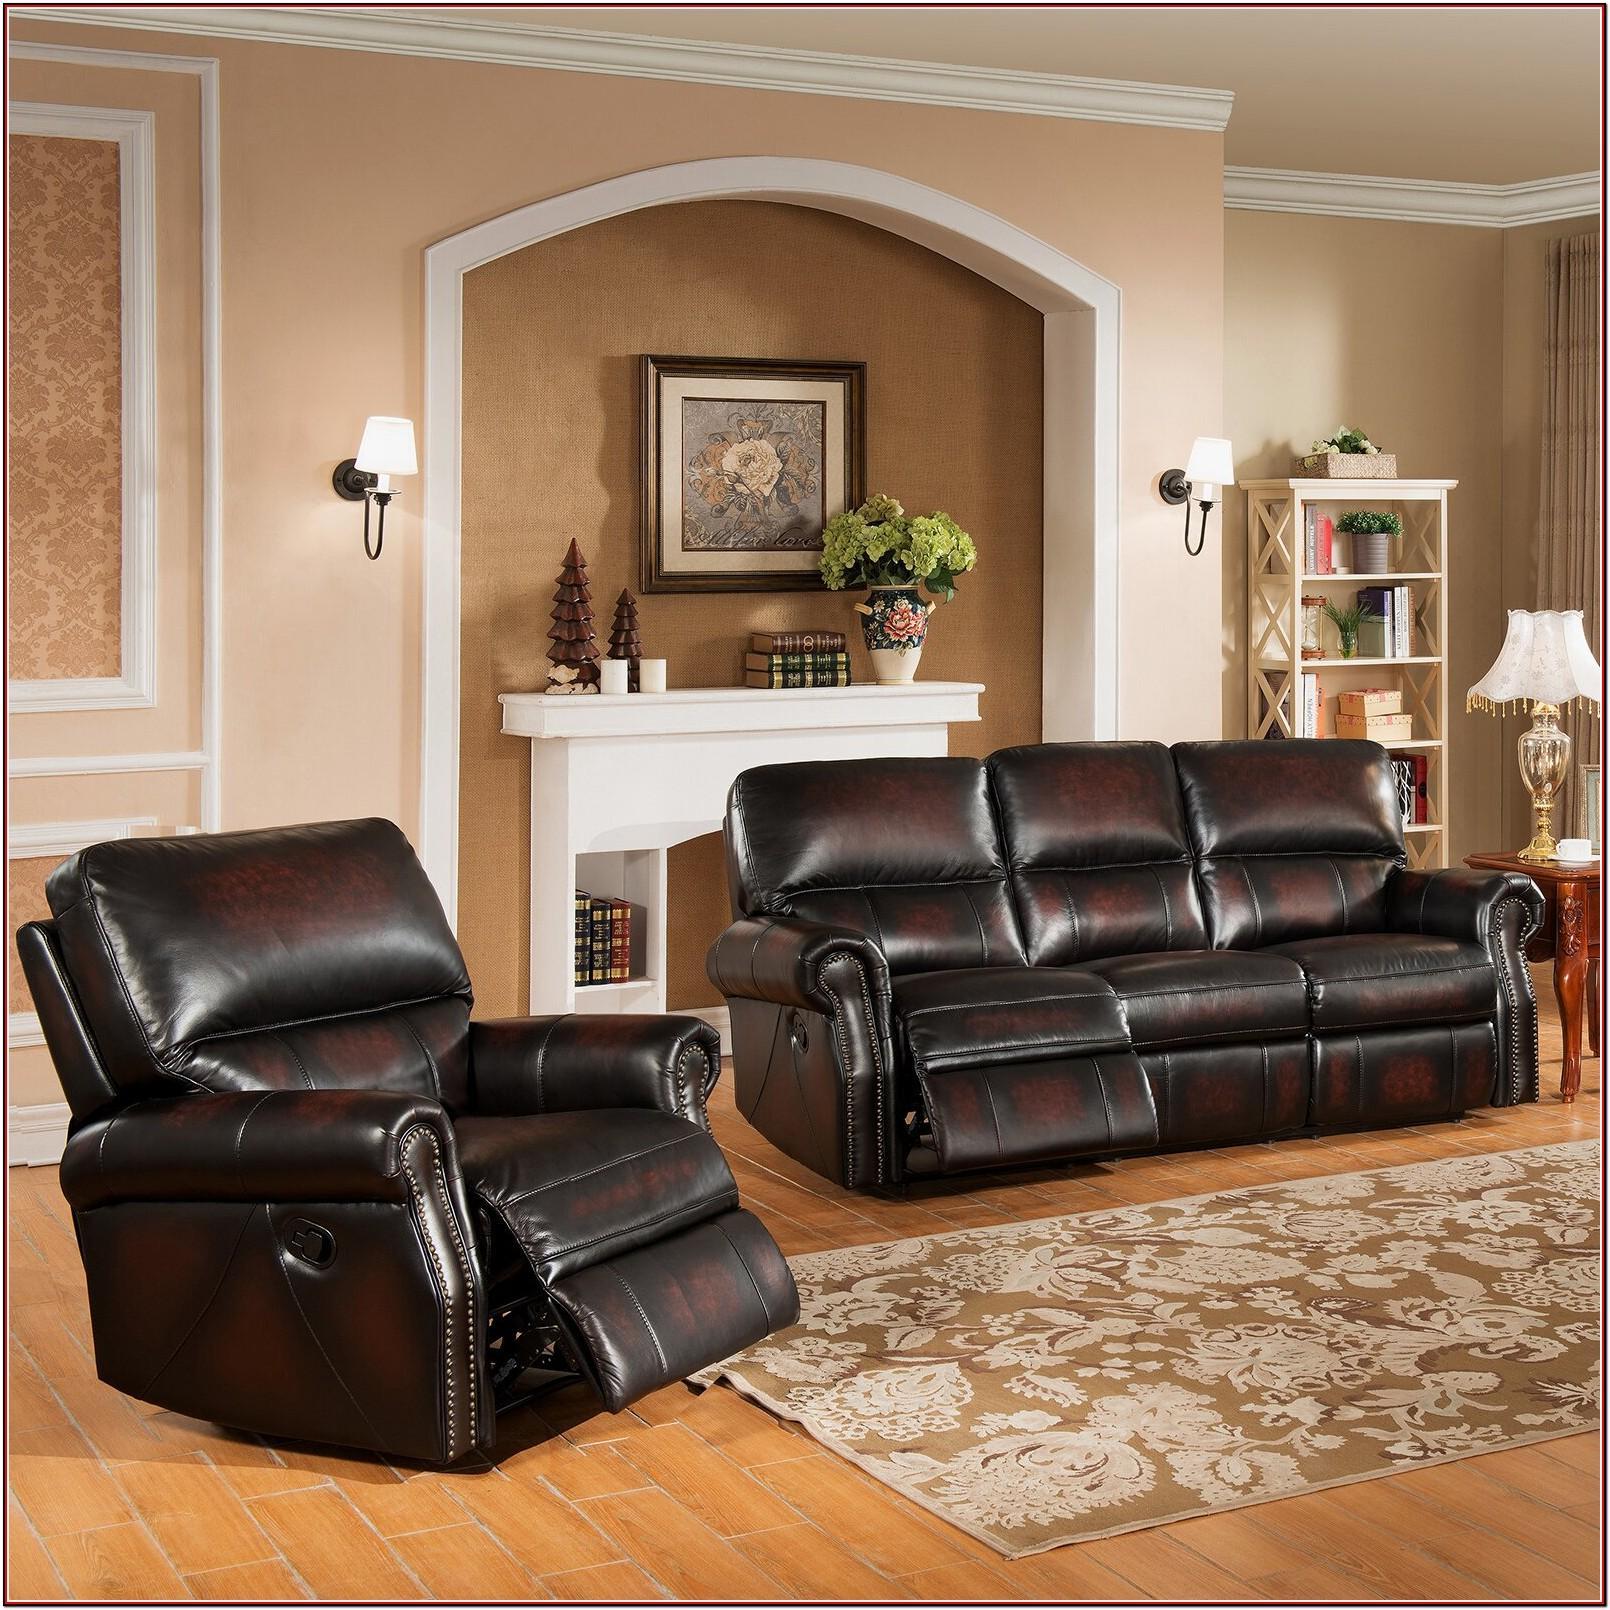 Leather Recliner Living Room Set